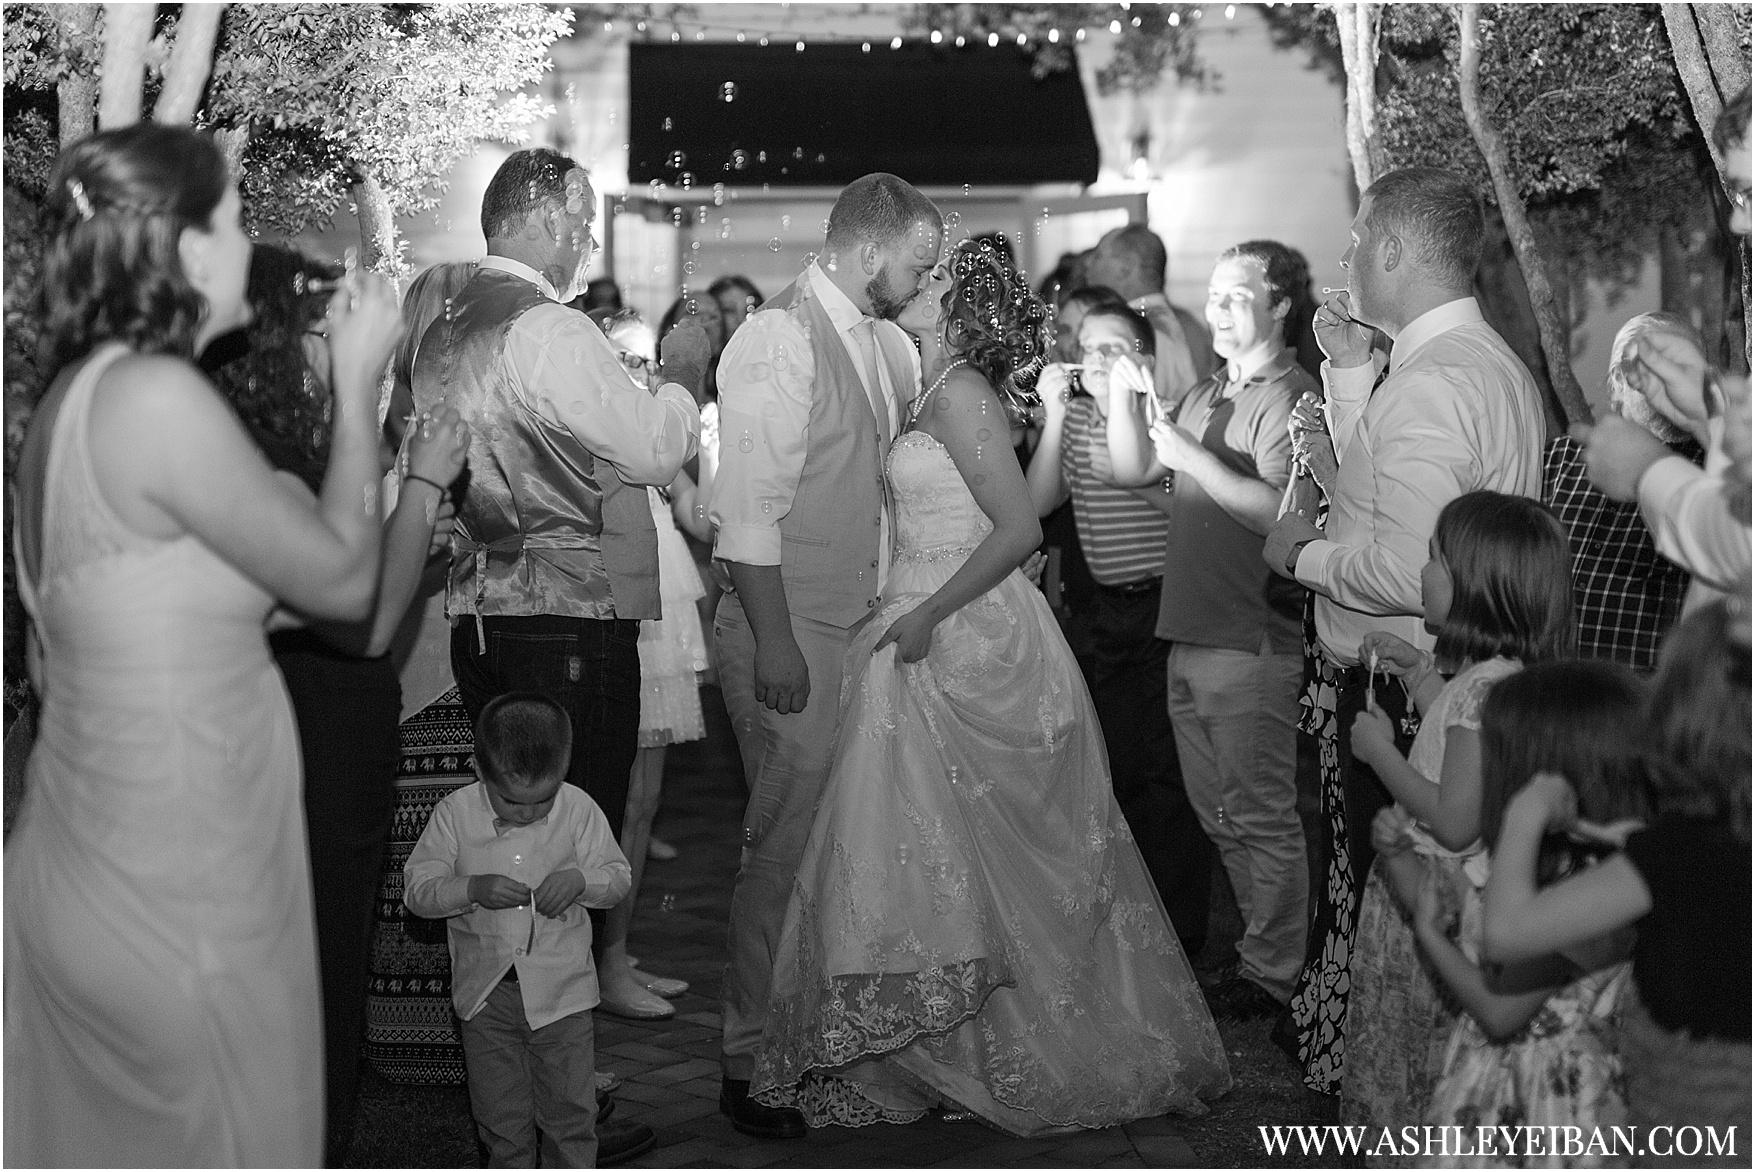 Wedding at The Trivium Estates    Lynchburg, VA Wedding Photographer    Central VA Wedding Photographer    Ashley Eiban Photography    www.ashleyeiban.com